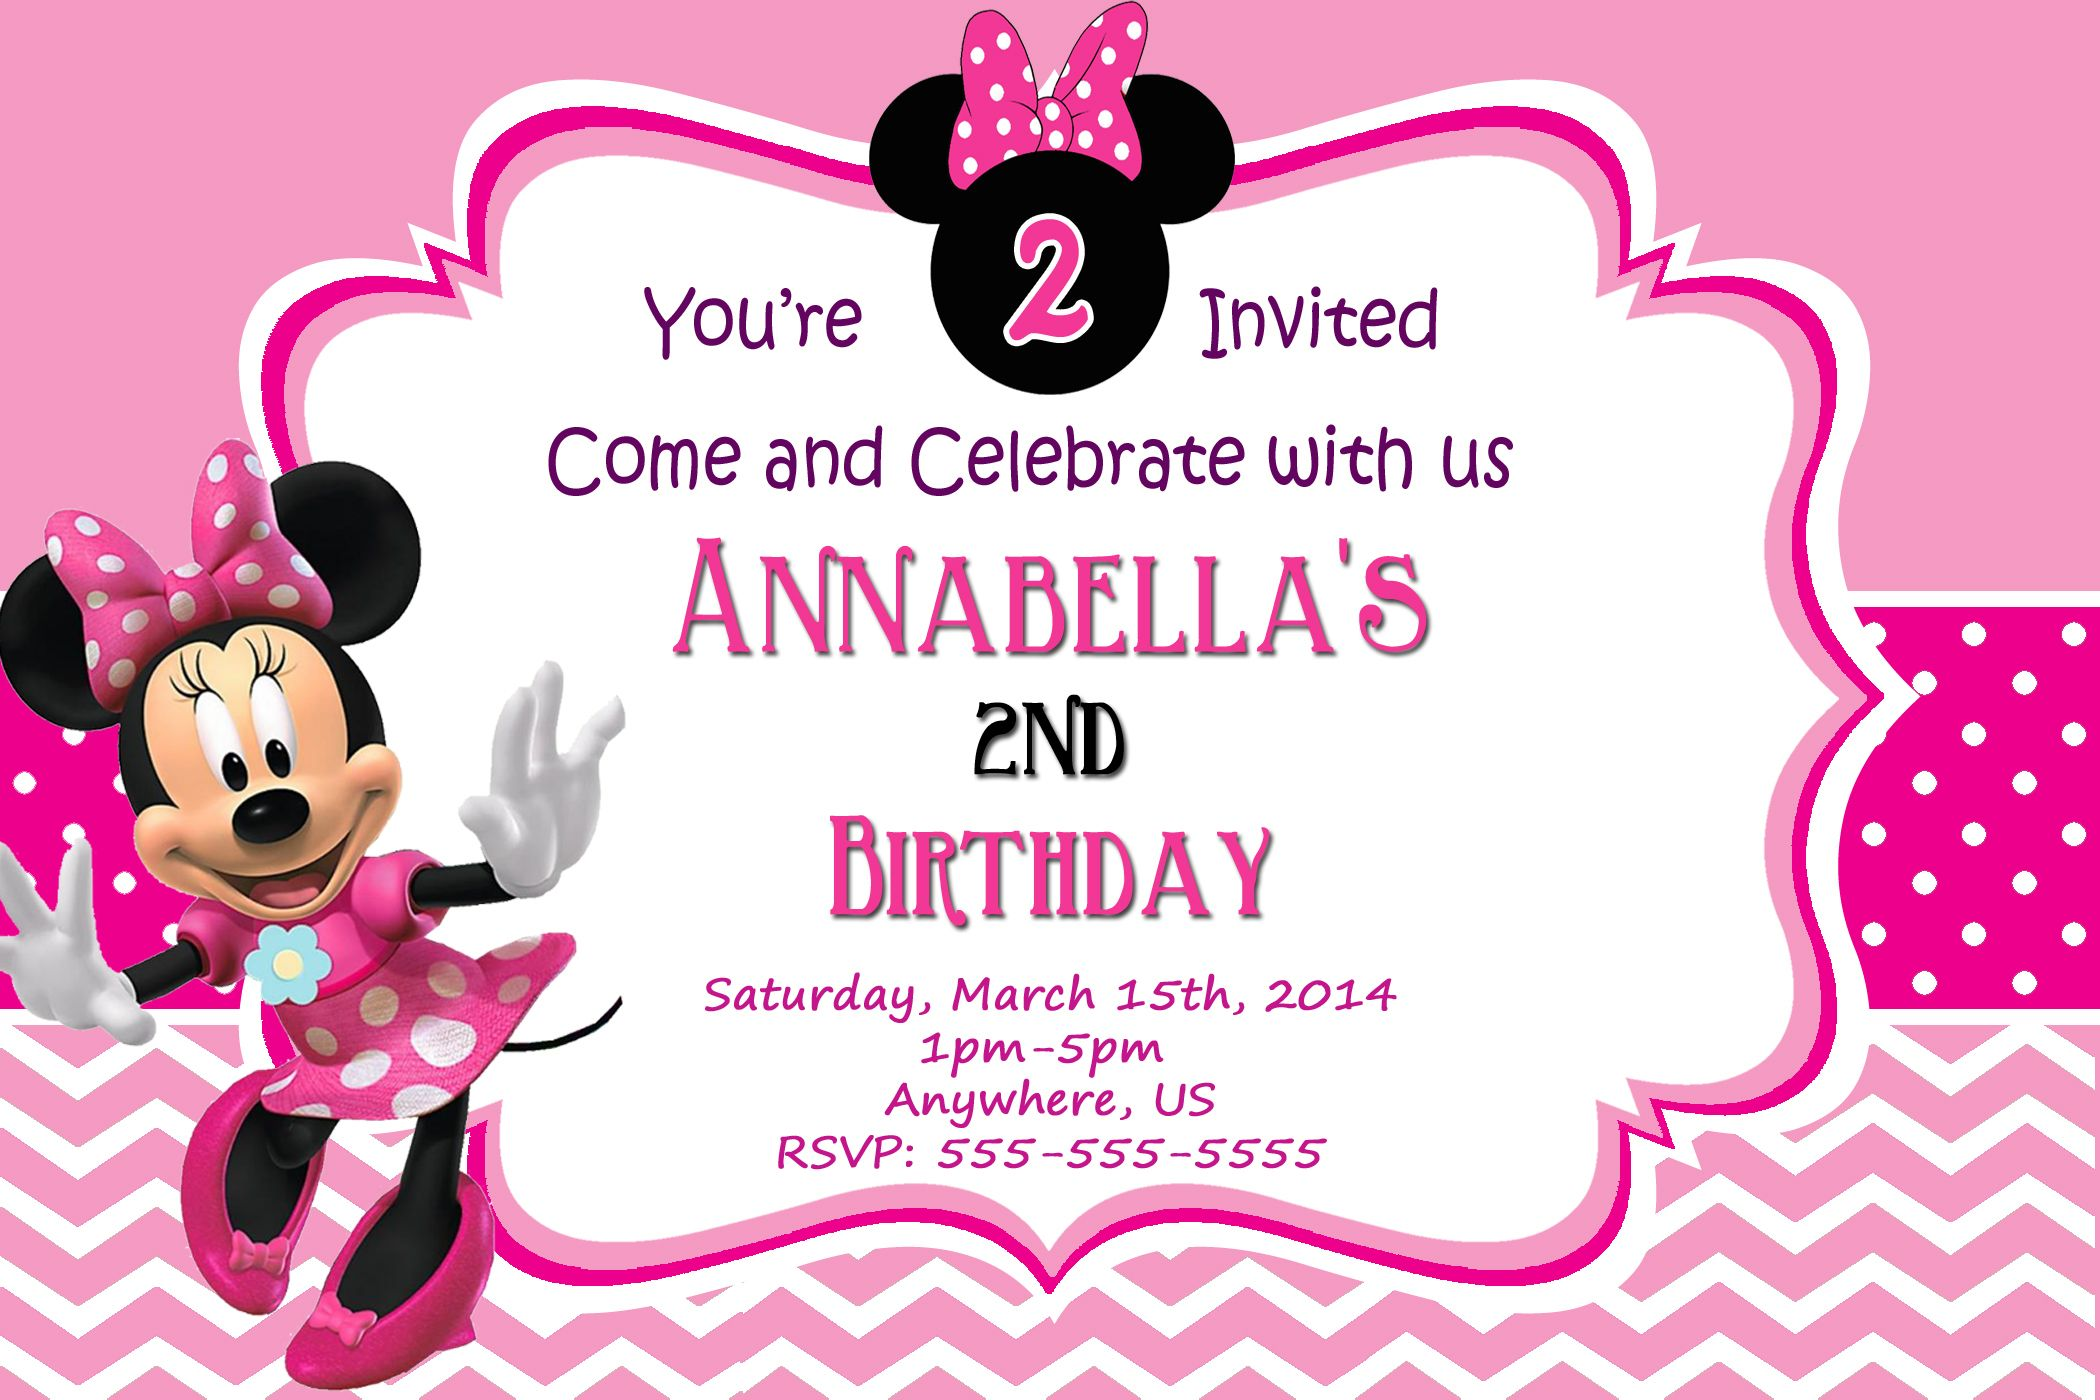 Baby Minnie 1st Birthday Invitation $8.99 | Minnie Mouse Birthday ...